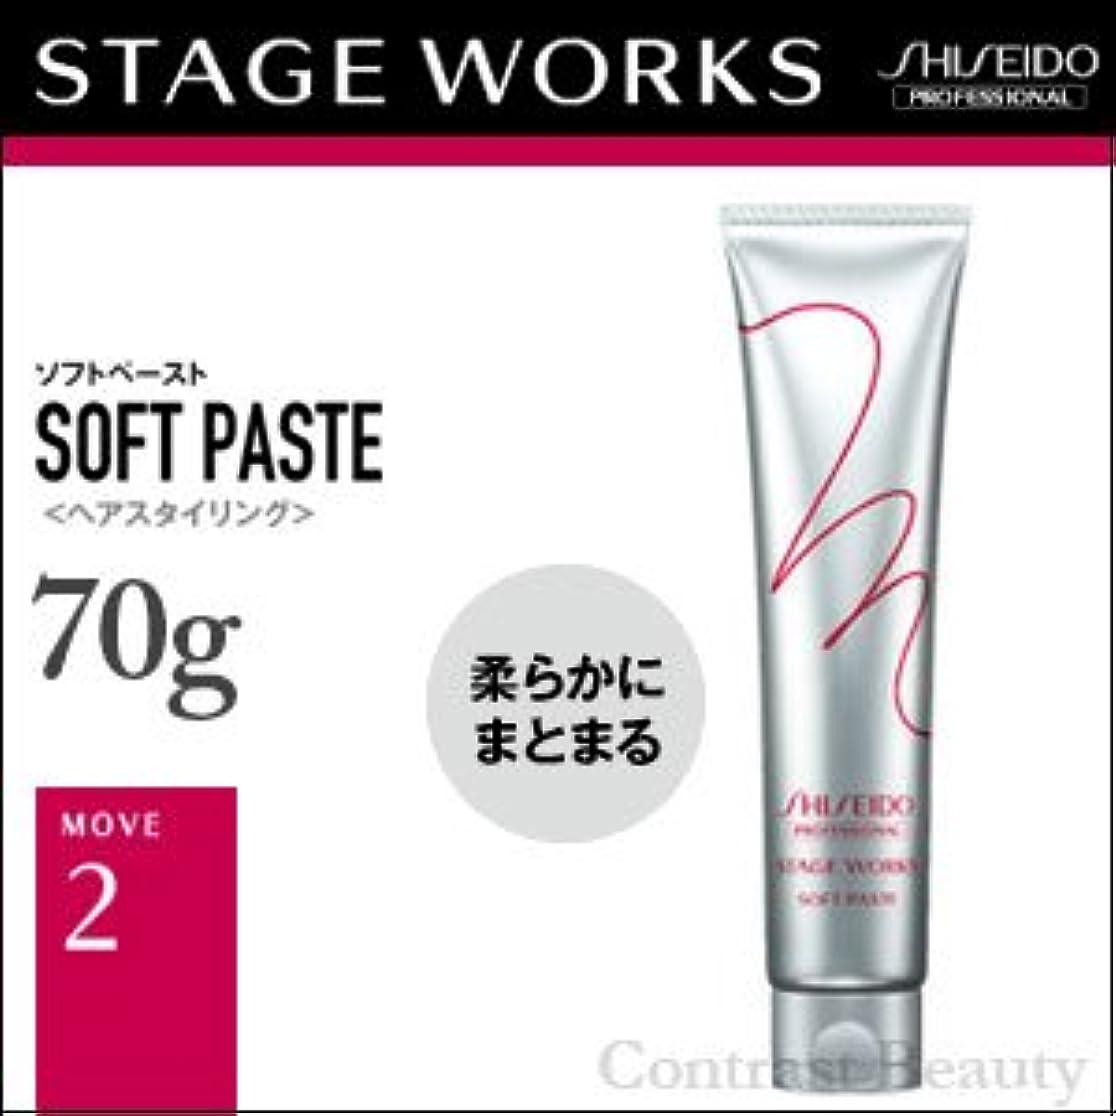 【x2個セット】 資生堂 ステージワークス ムーブ2 ソフトペースト 70g